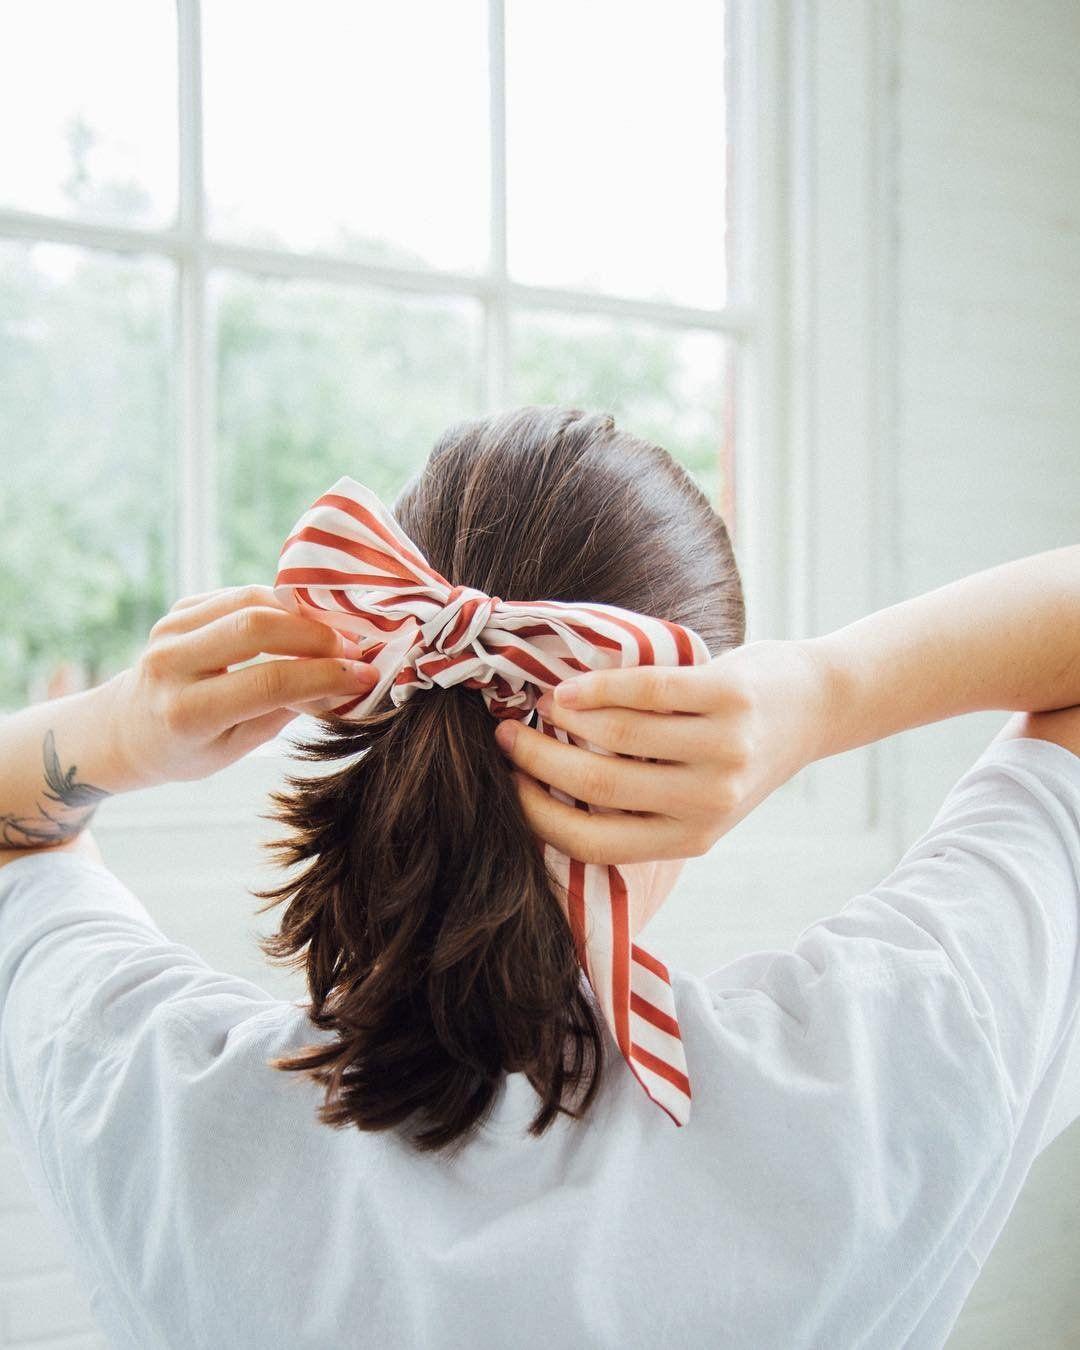 Pin by kardian on uextrasu in pinterest hair styles